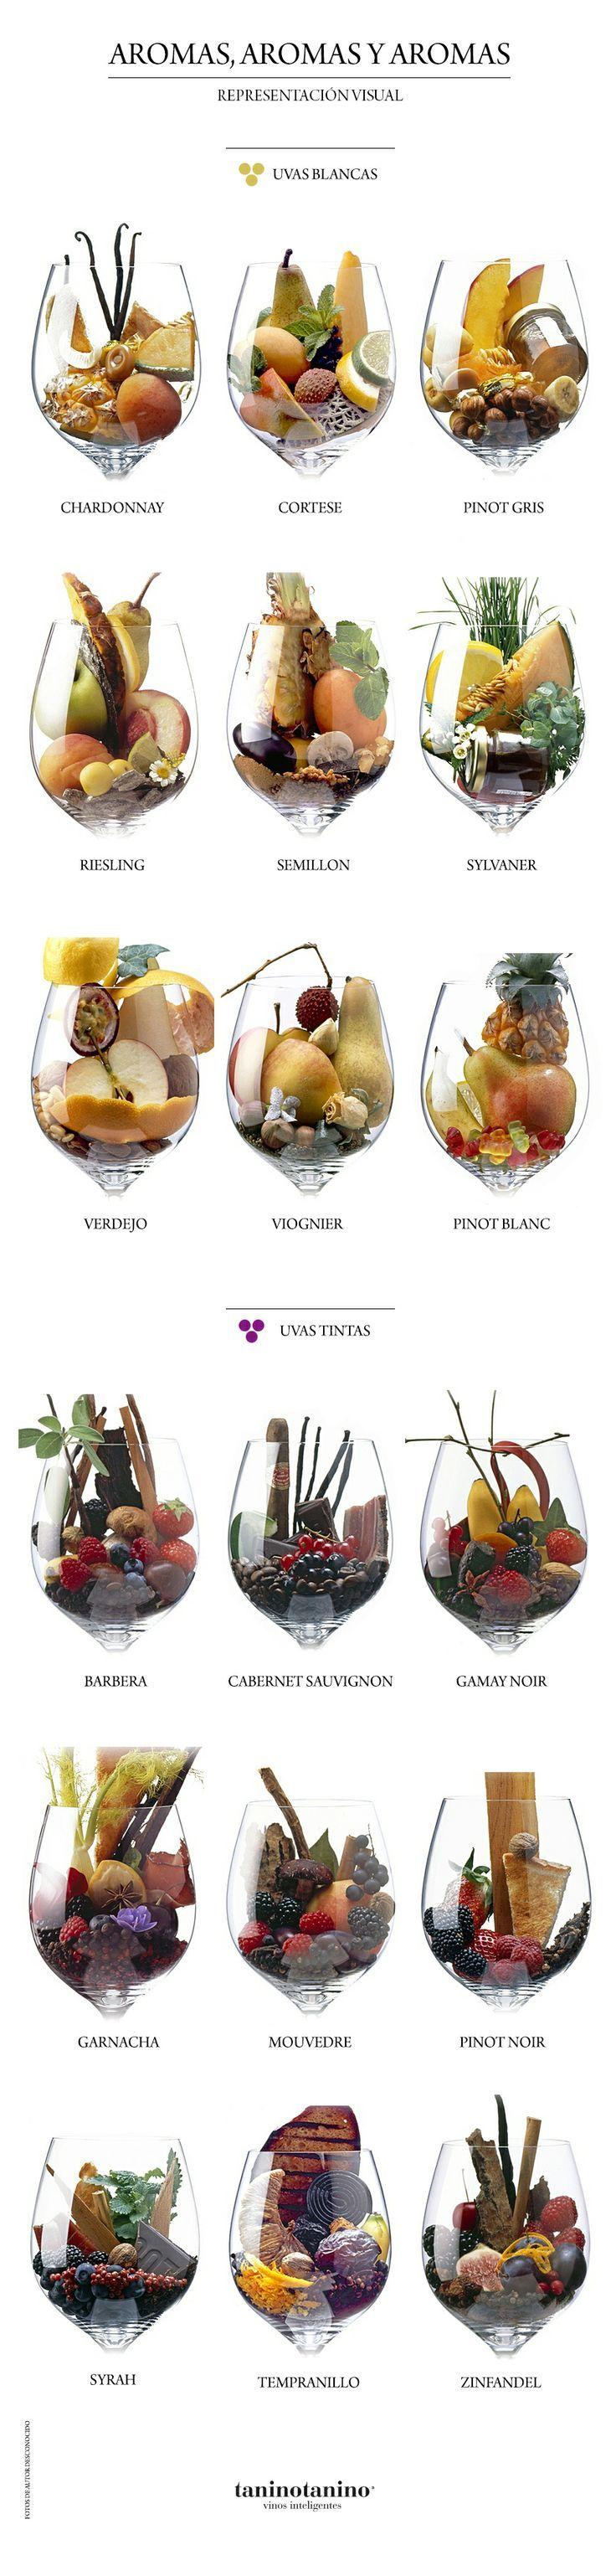 #KatieSheaDesign ♡❤ ❥▶ Classic aromas found in grapes #Wine